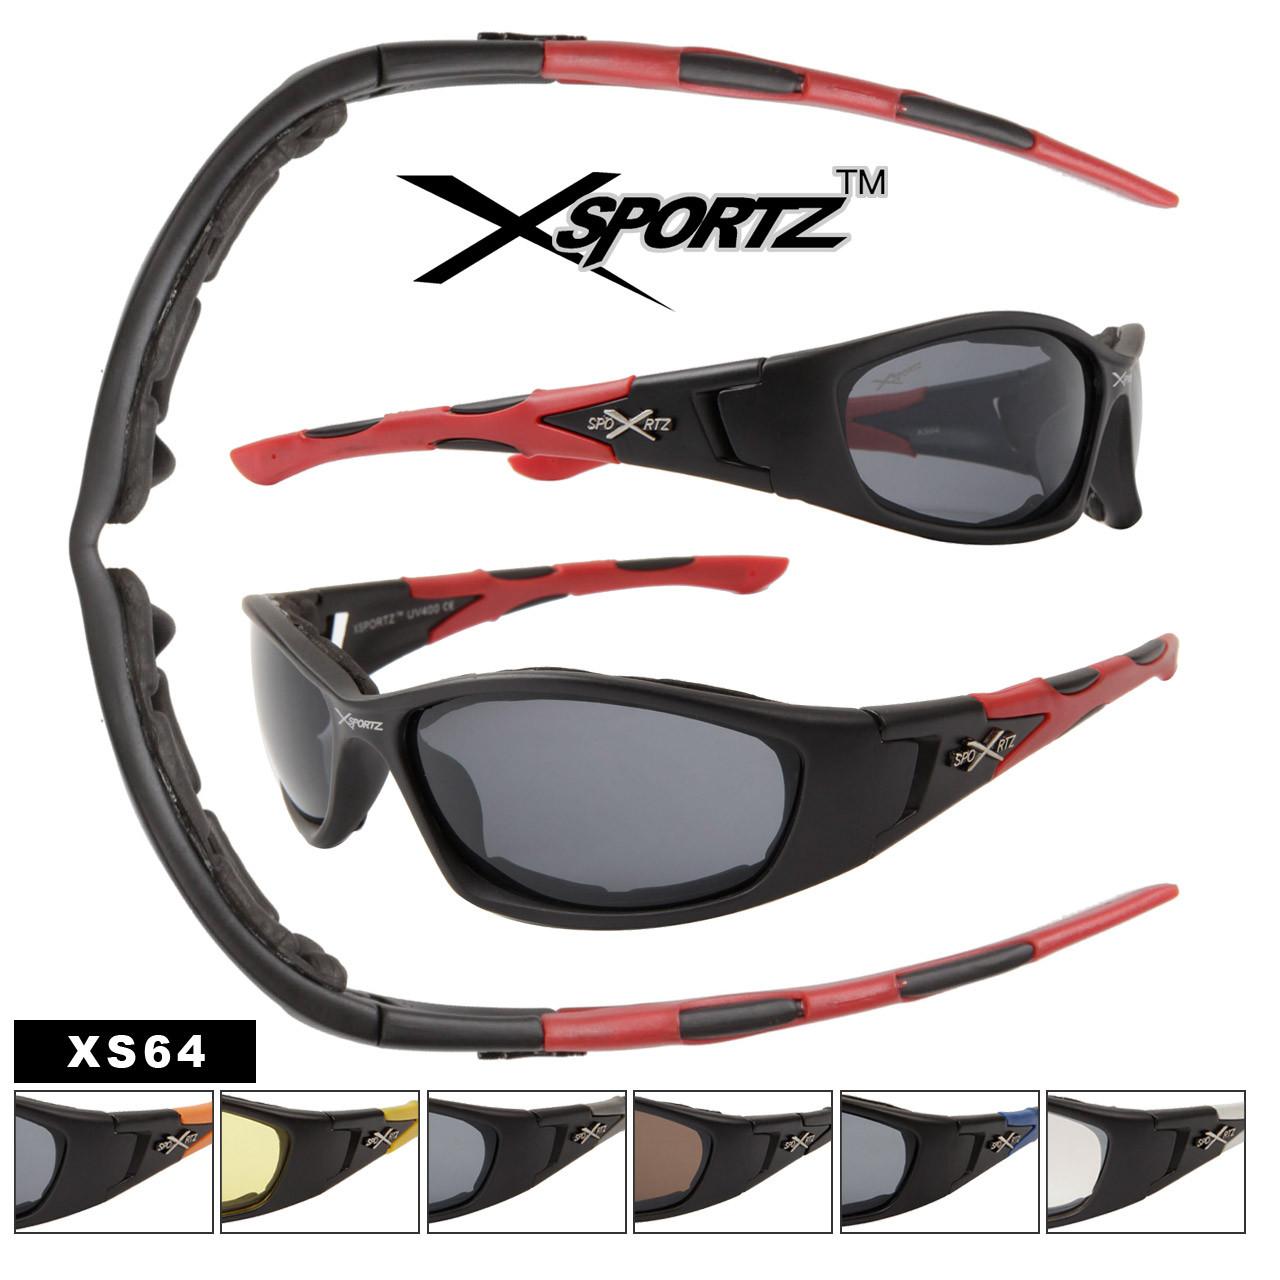 Foam Padded Xsportz Sunglasses XS64